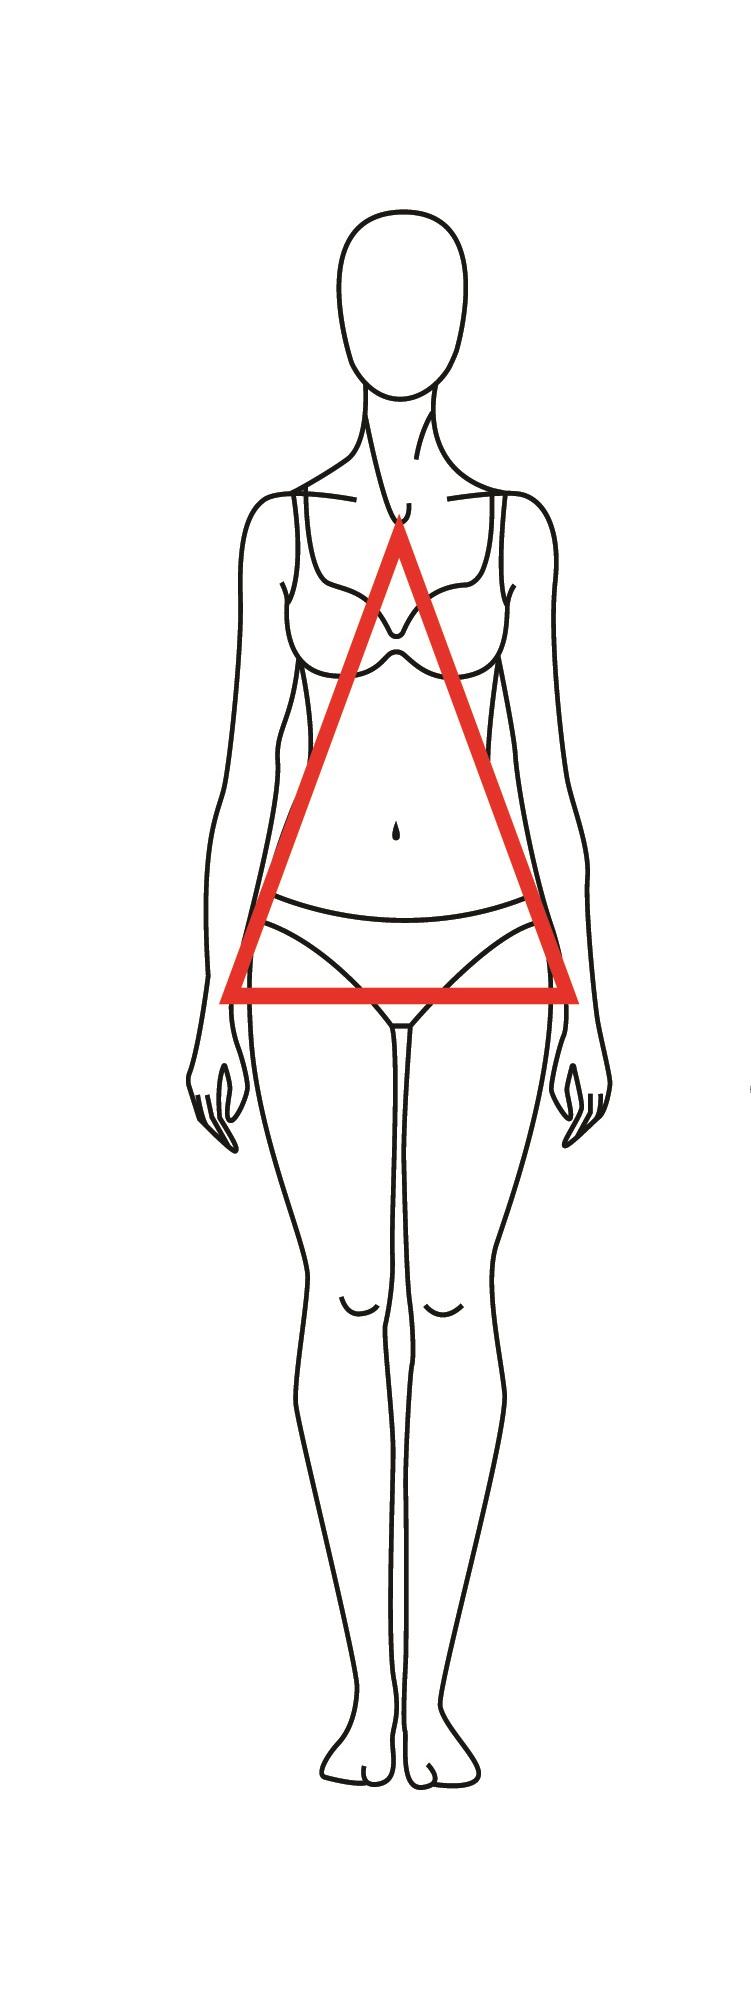 Triângulo normal